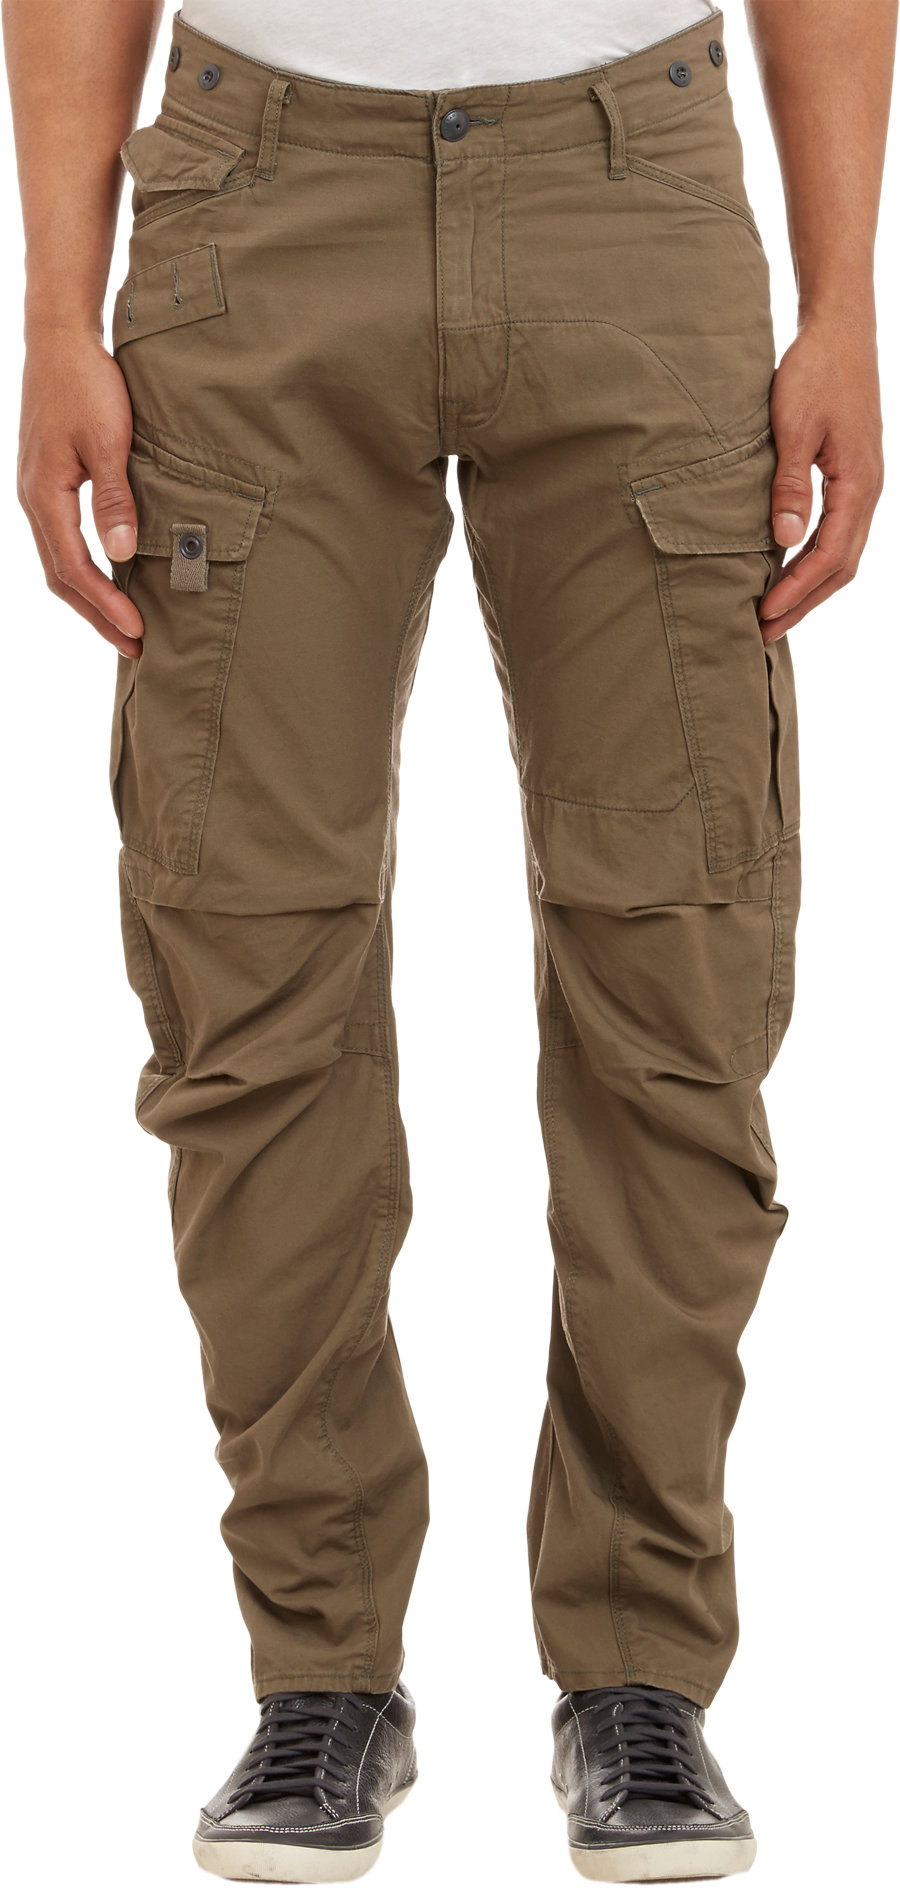 Mens Brown Jeans